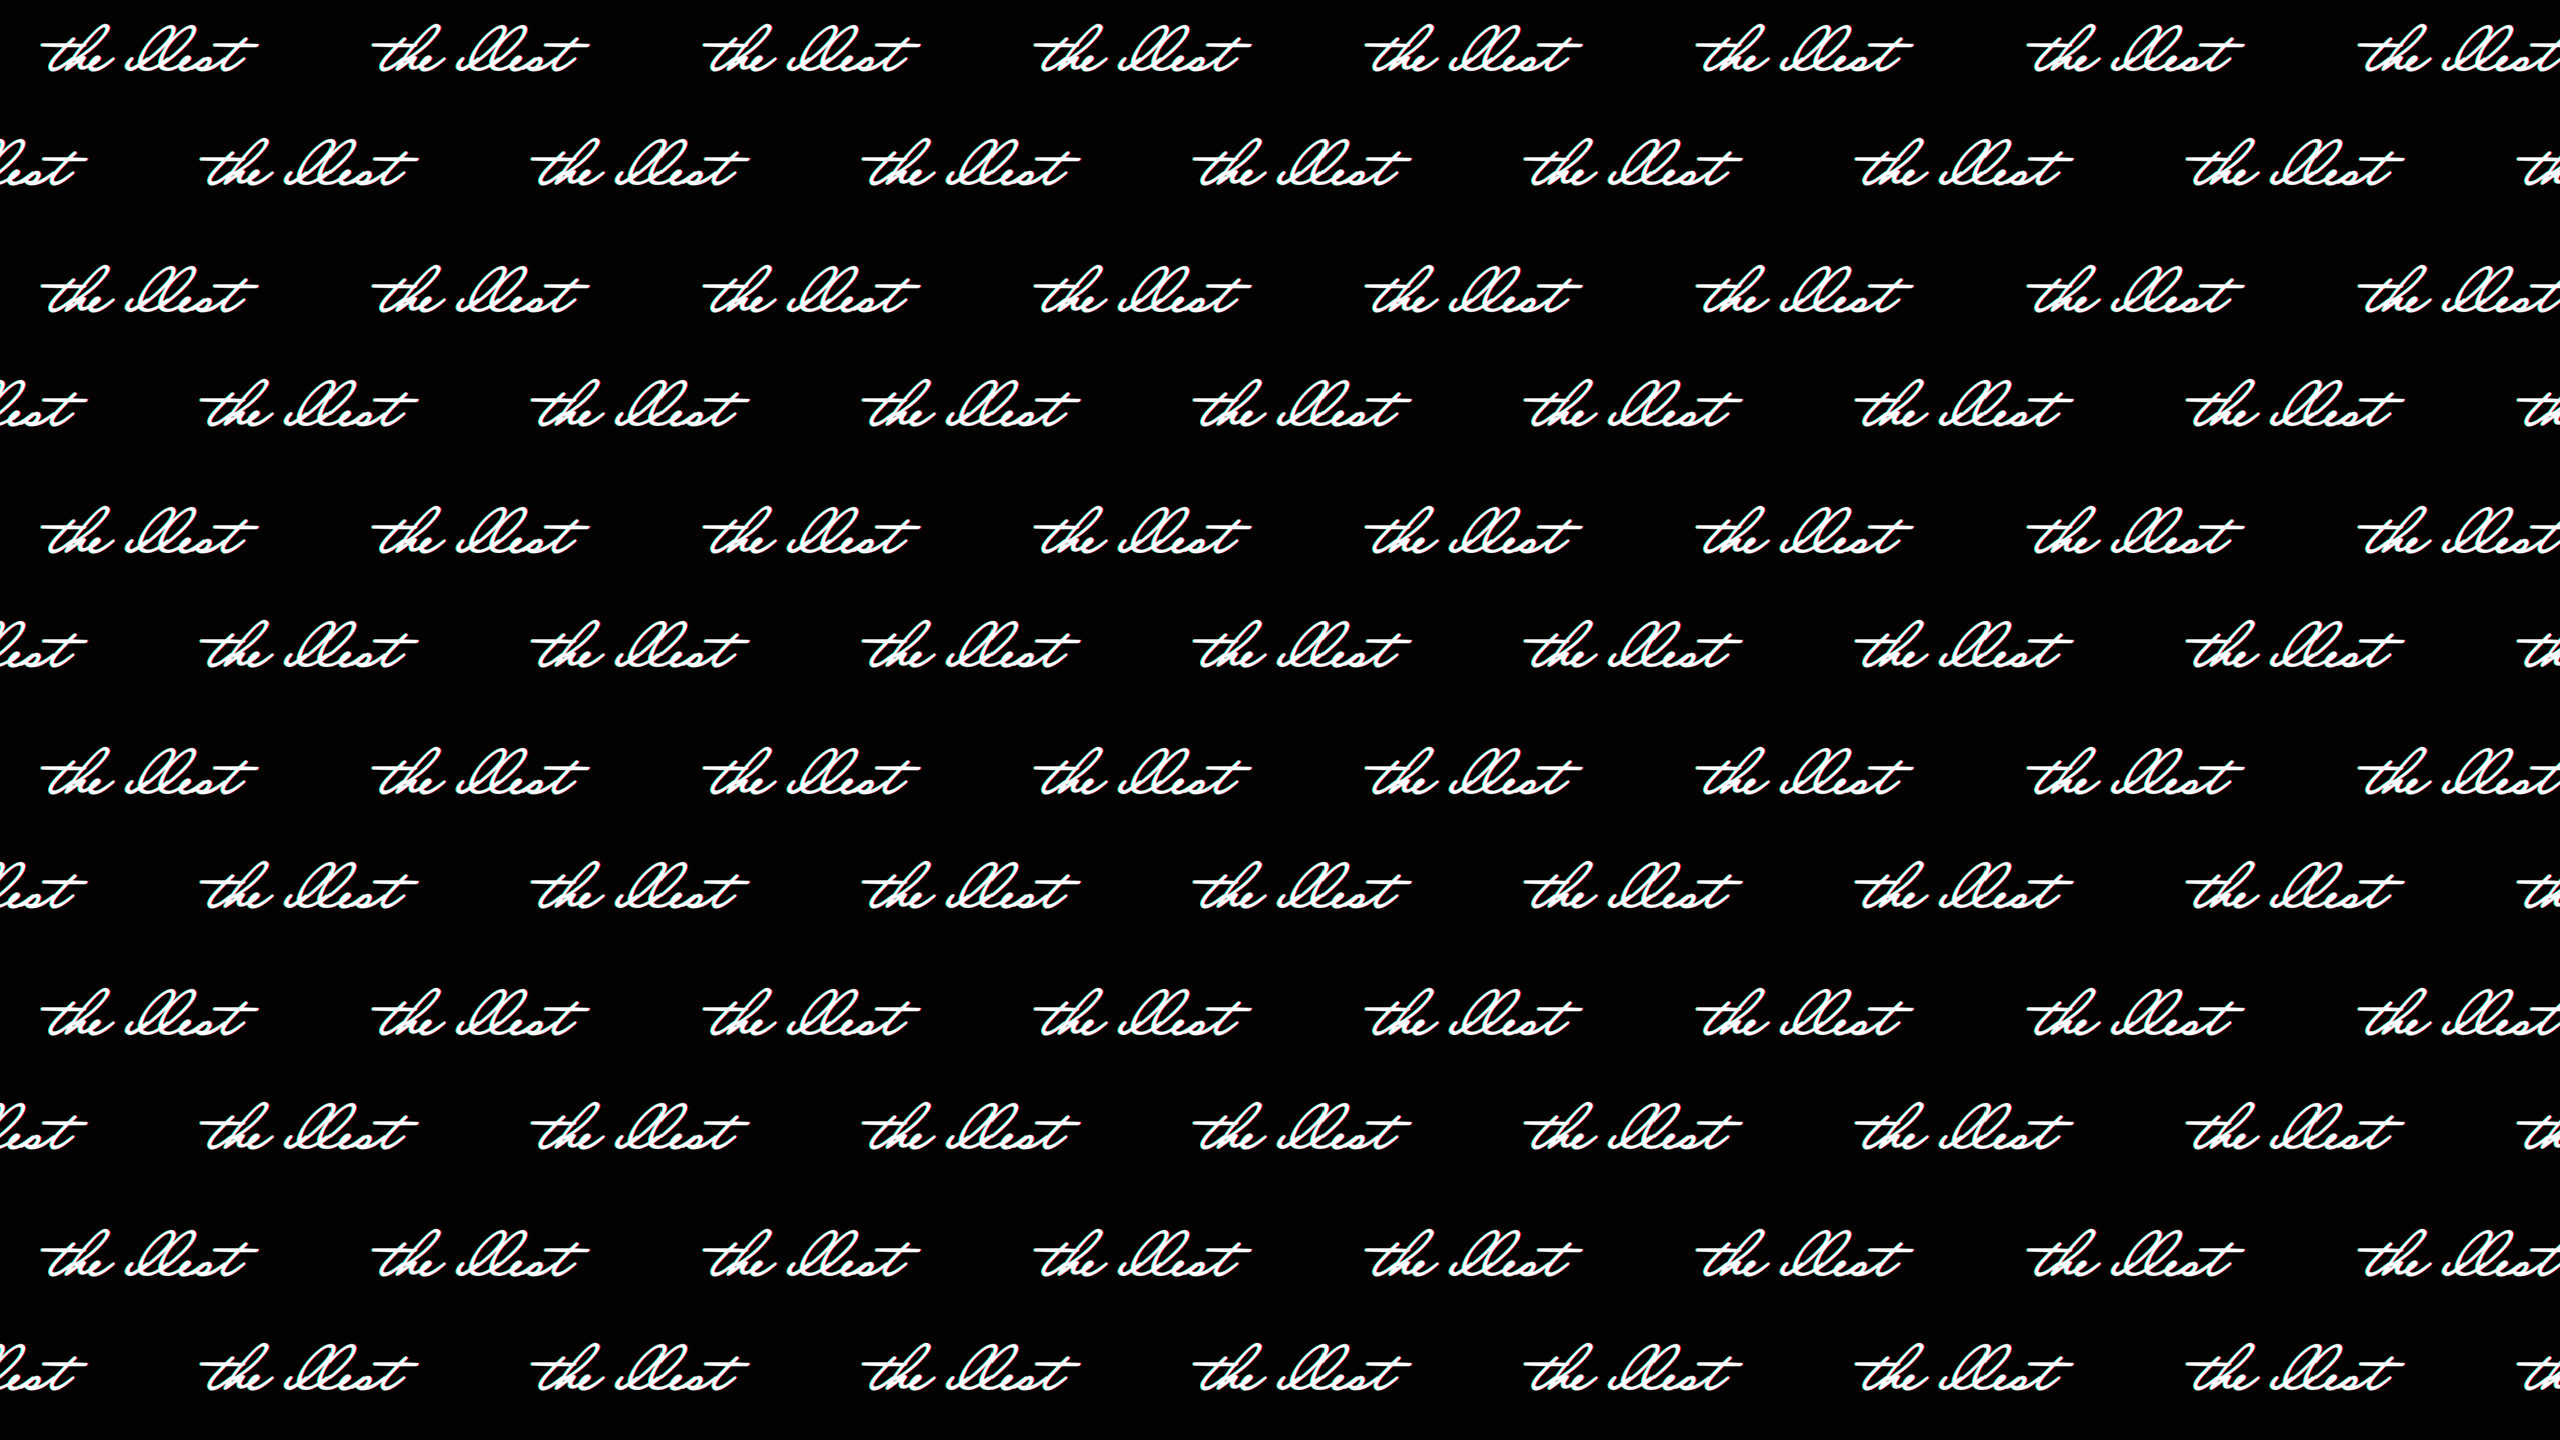 Illest Wallpaper HD 67 images 2560x1440